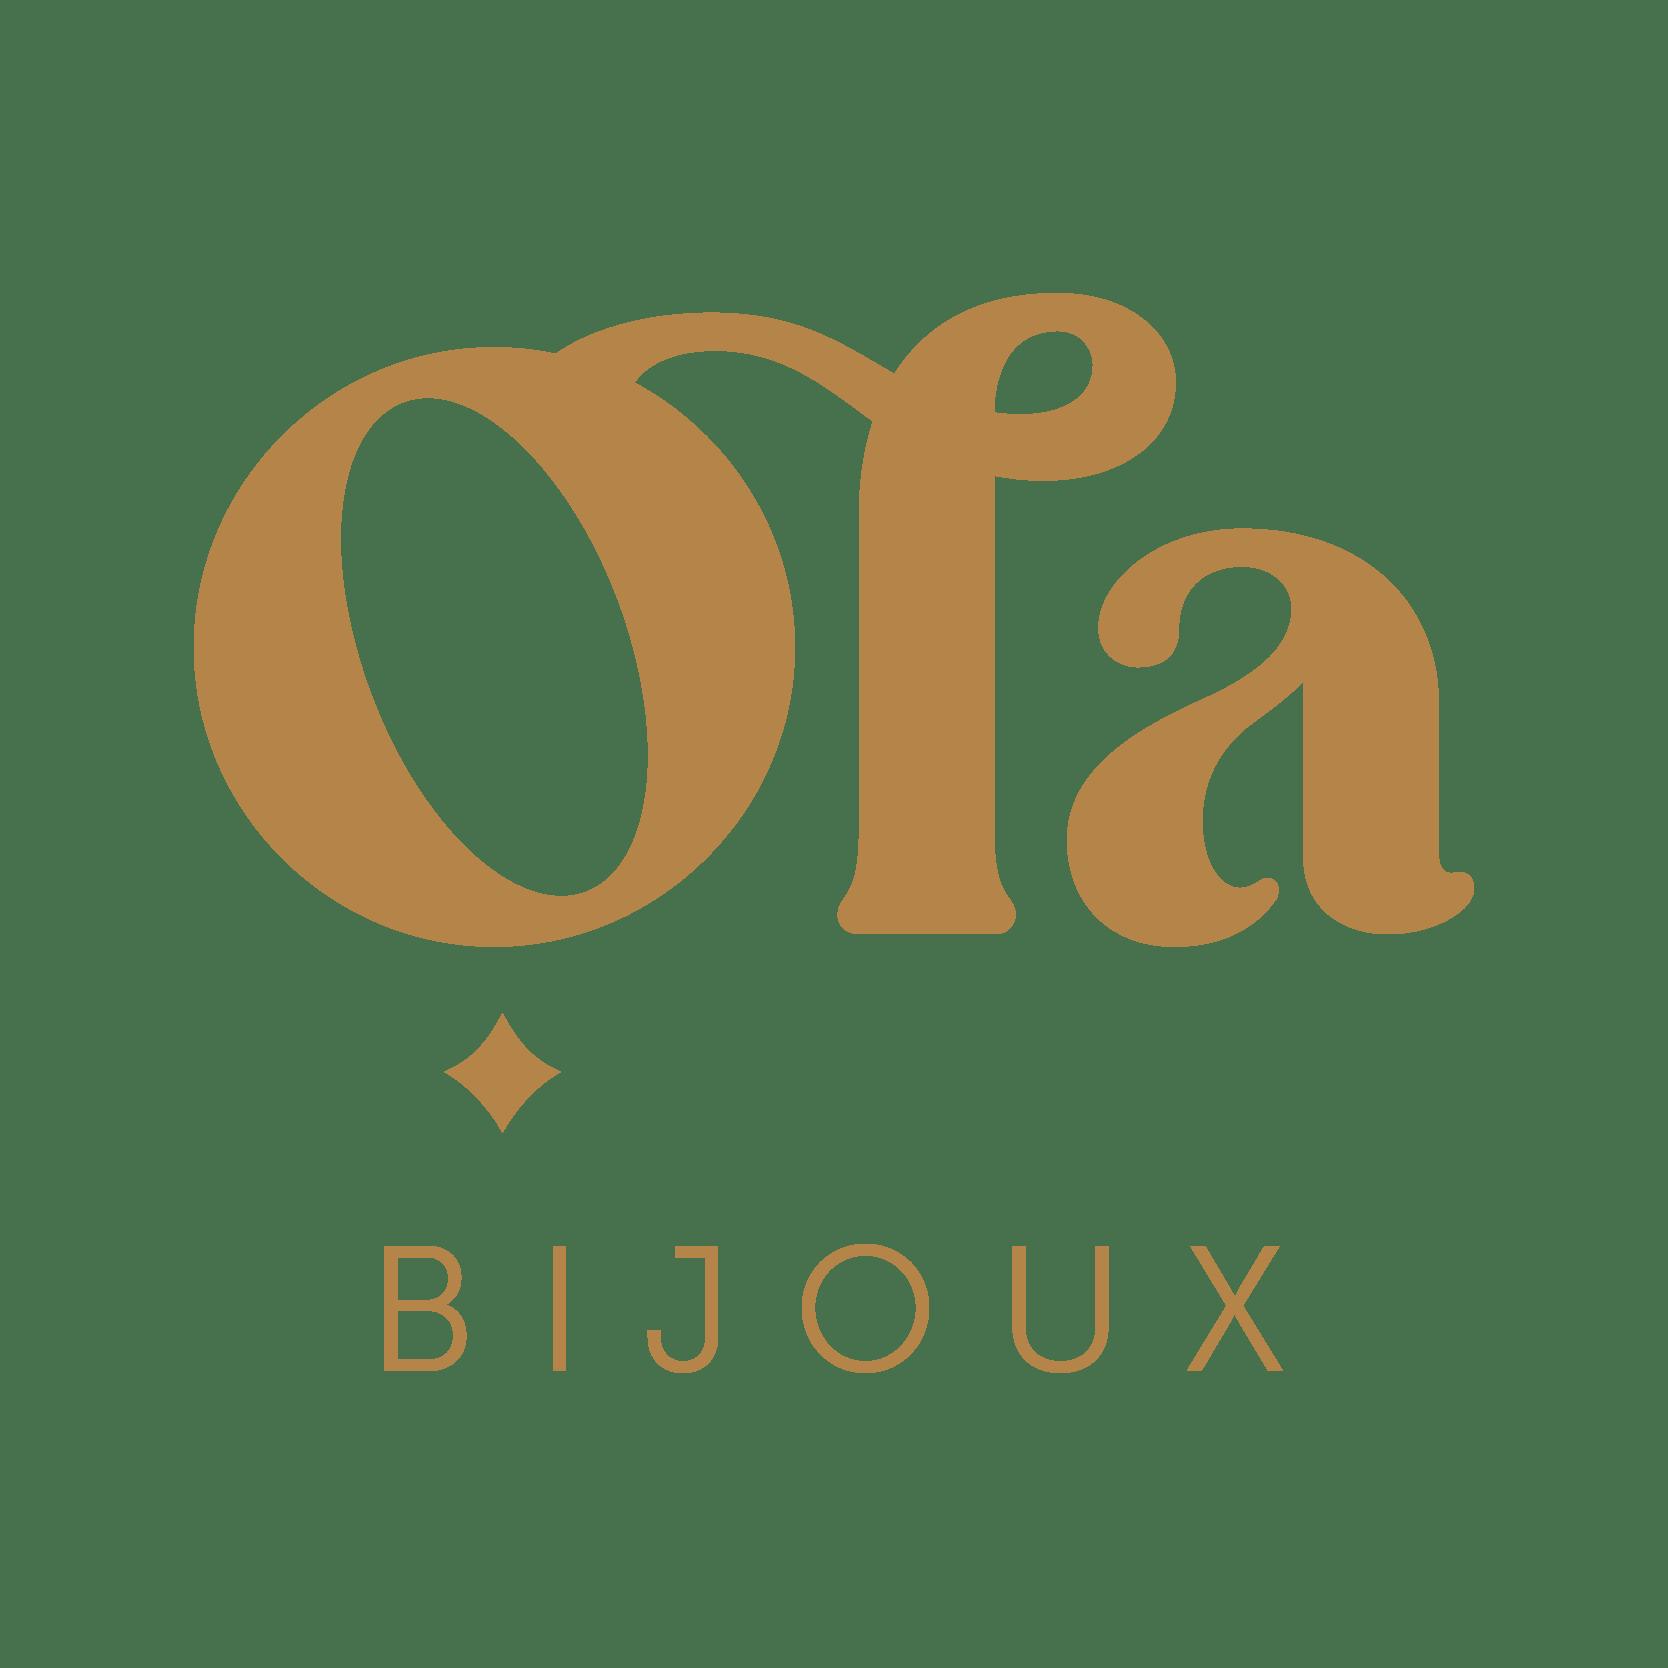 logo ola bijoux